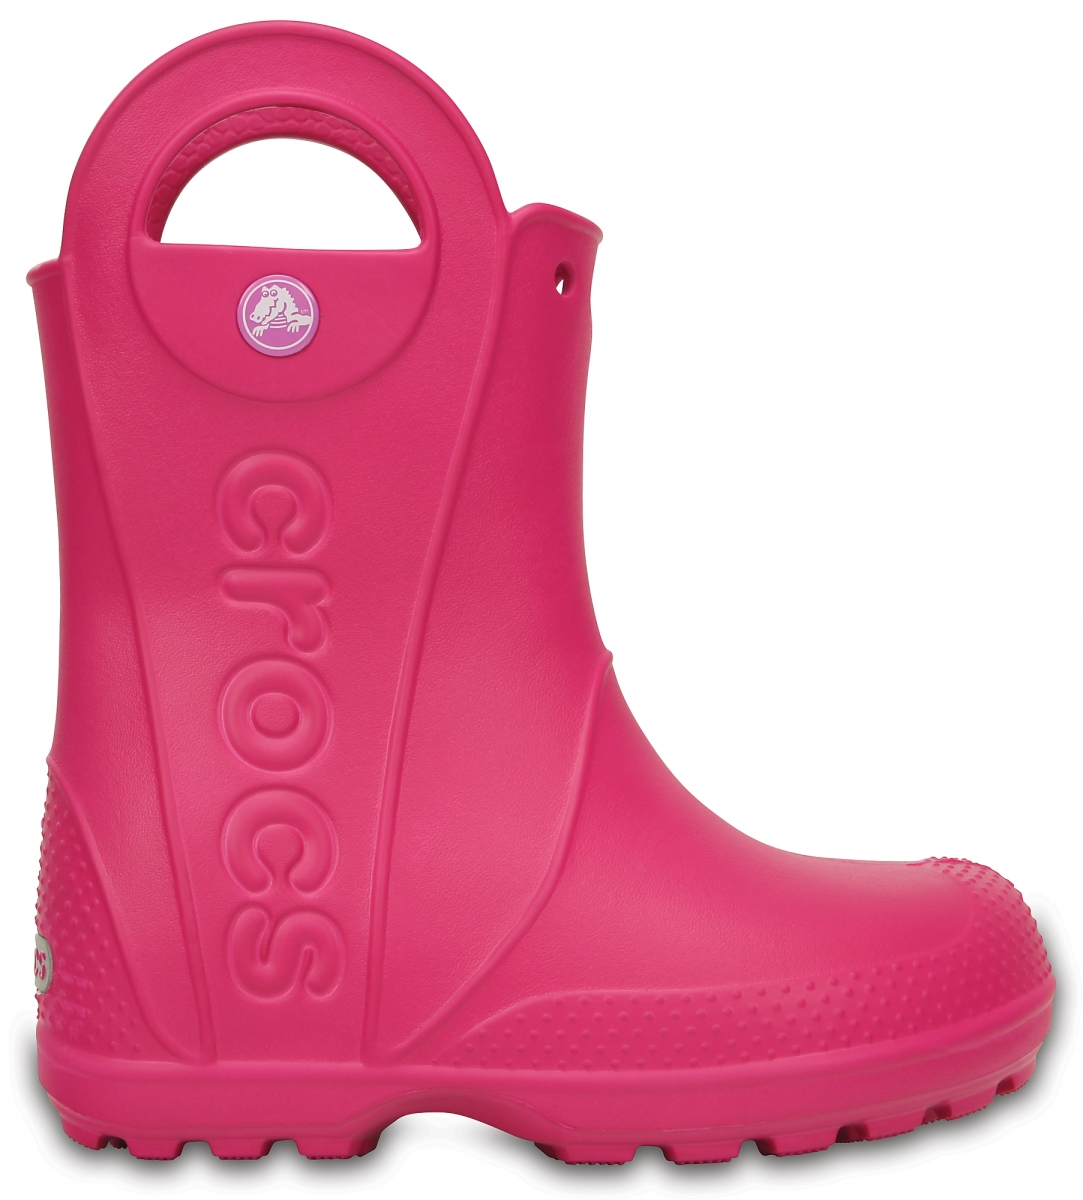 Crocs Handle It Rain Boot Kids - Candy Pink, C10 (27-28)